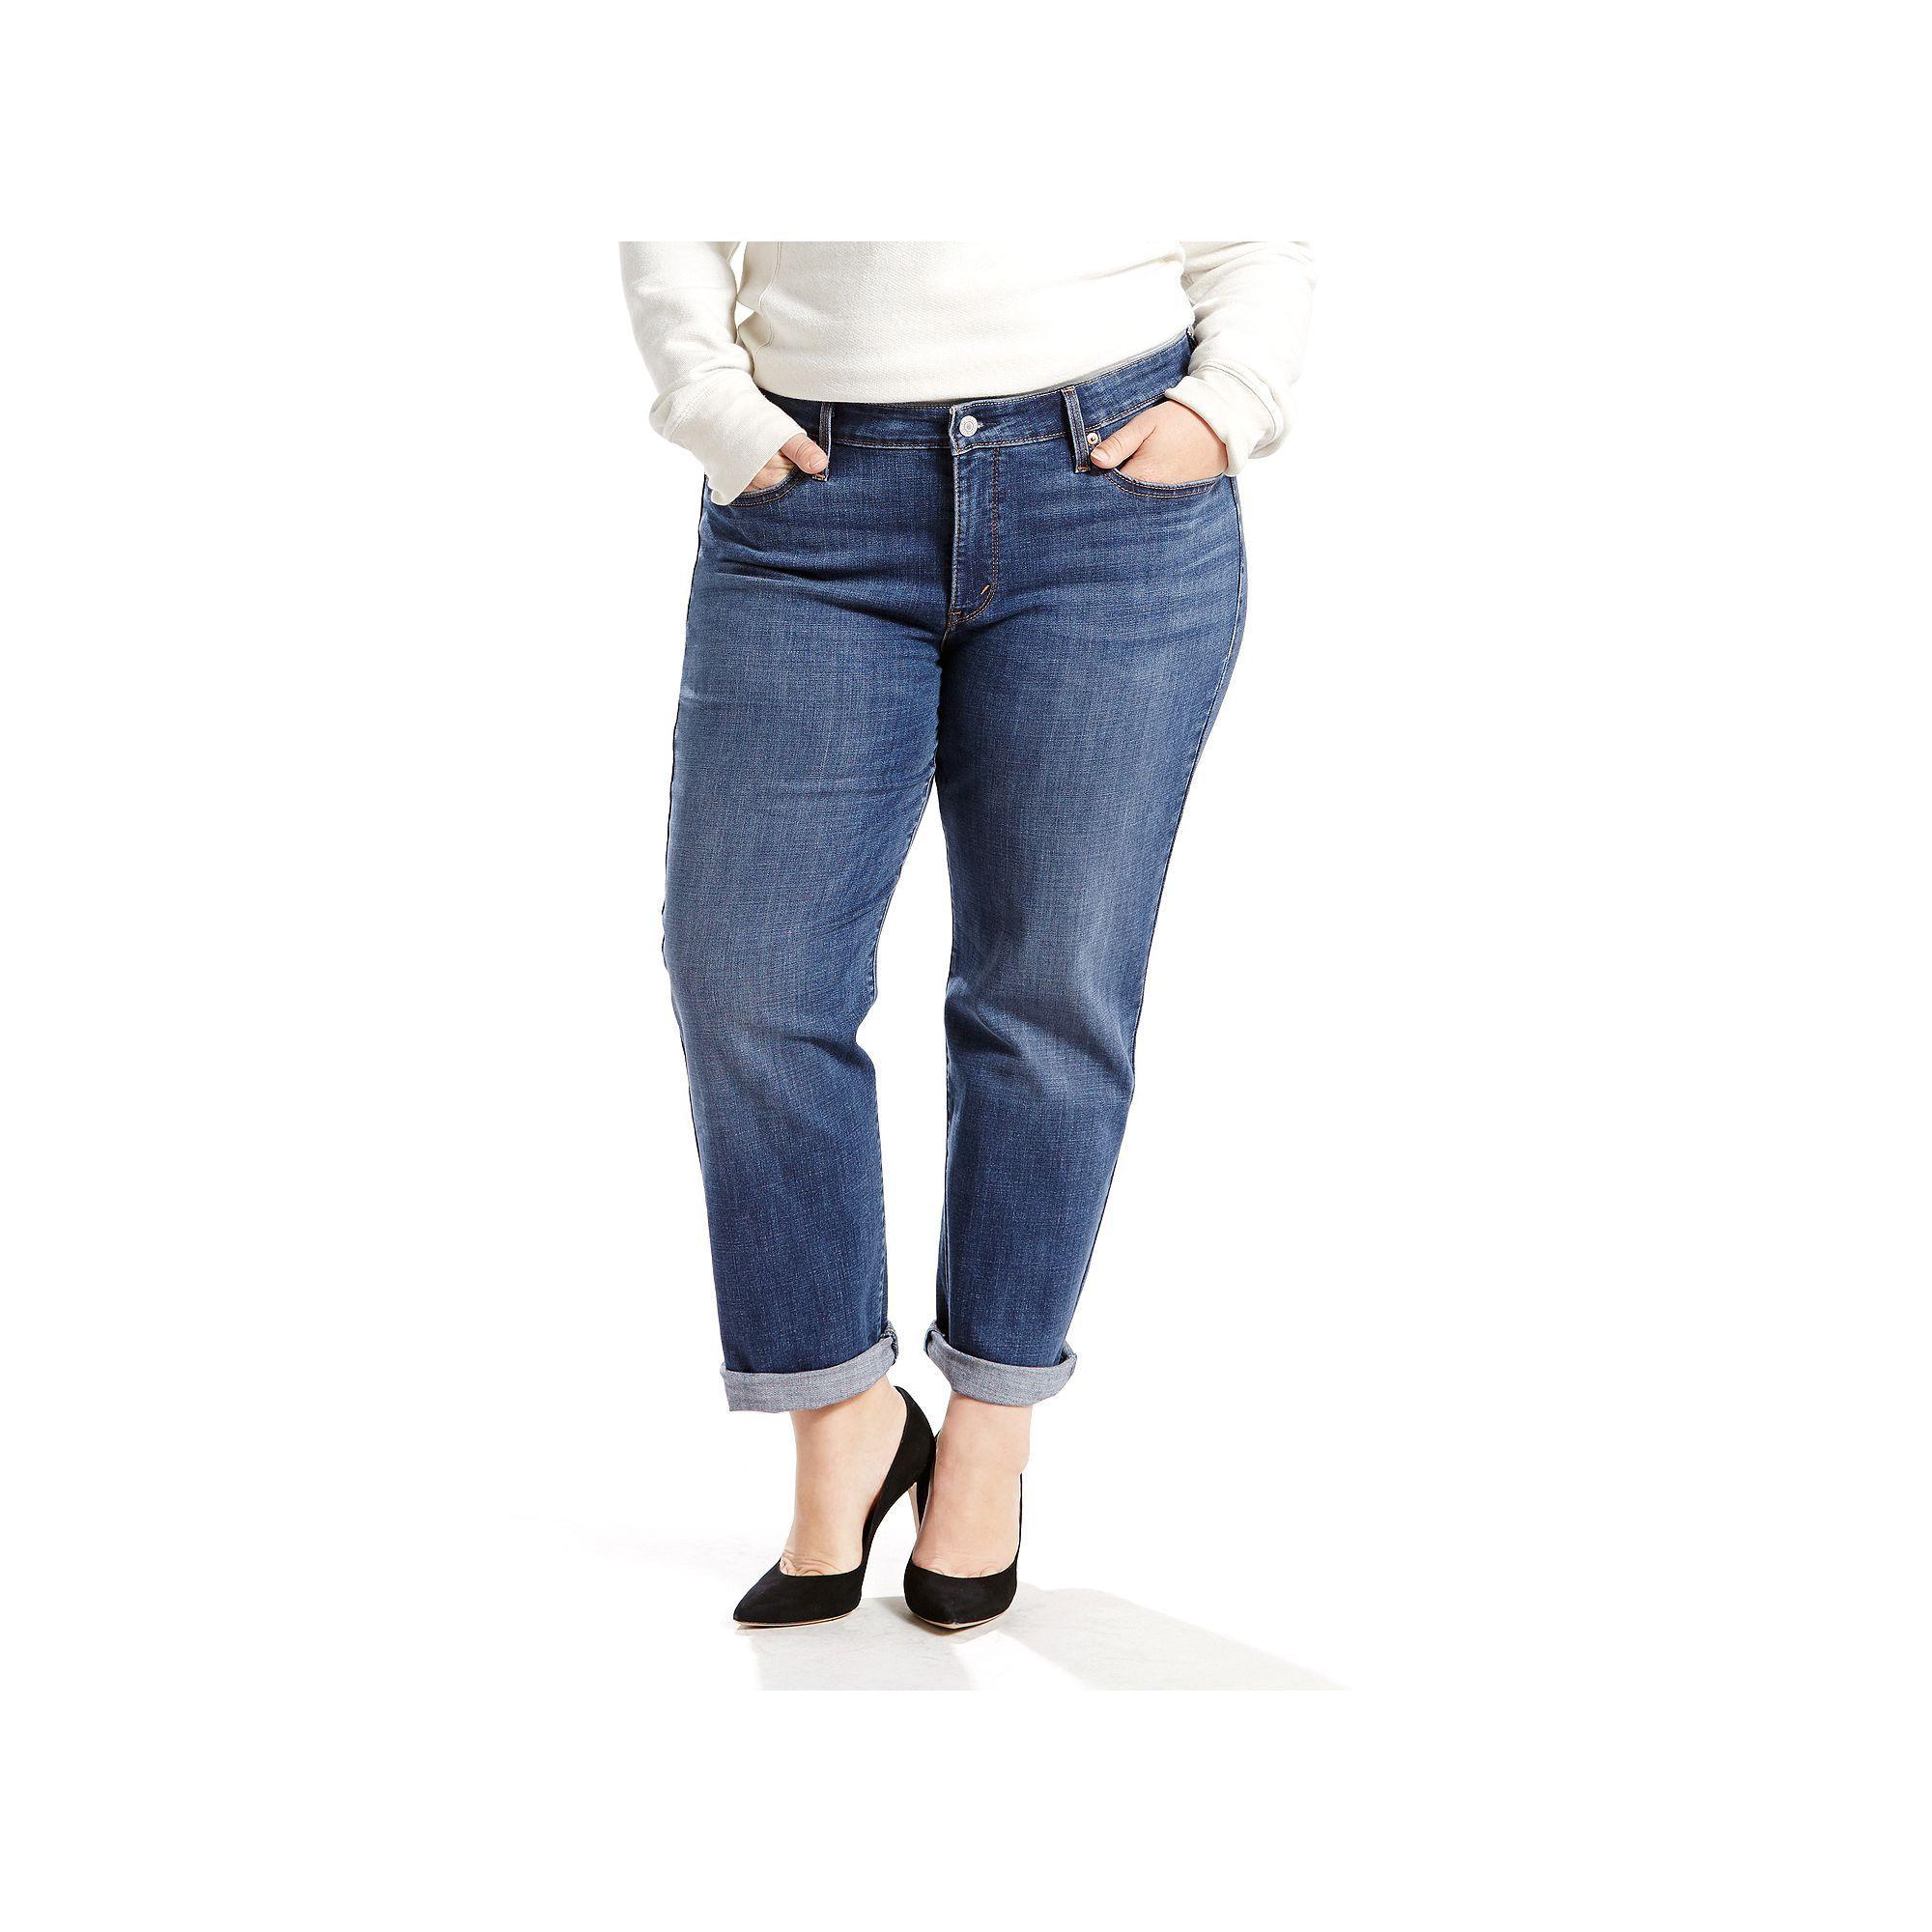 422a8ede25a Plus Size Levi s Boyfriend Jeans in 2019